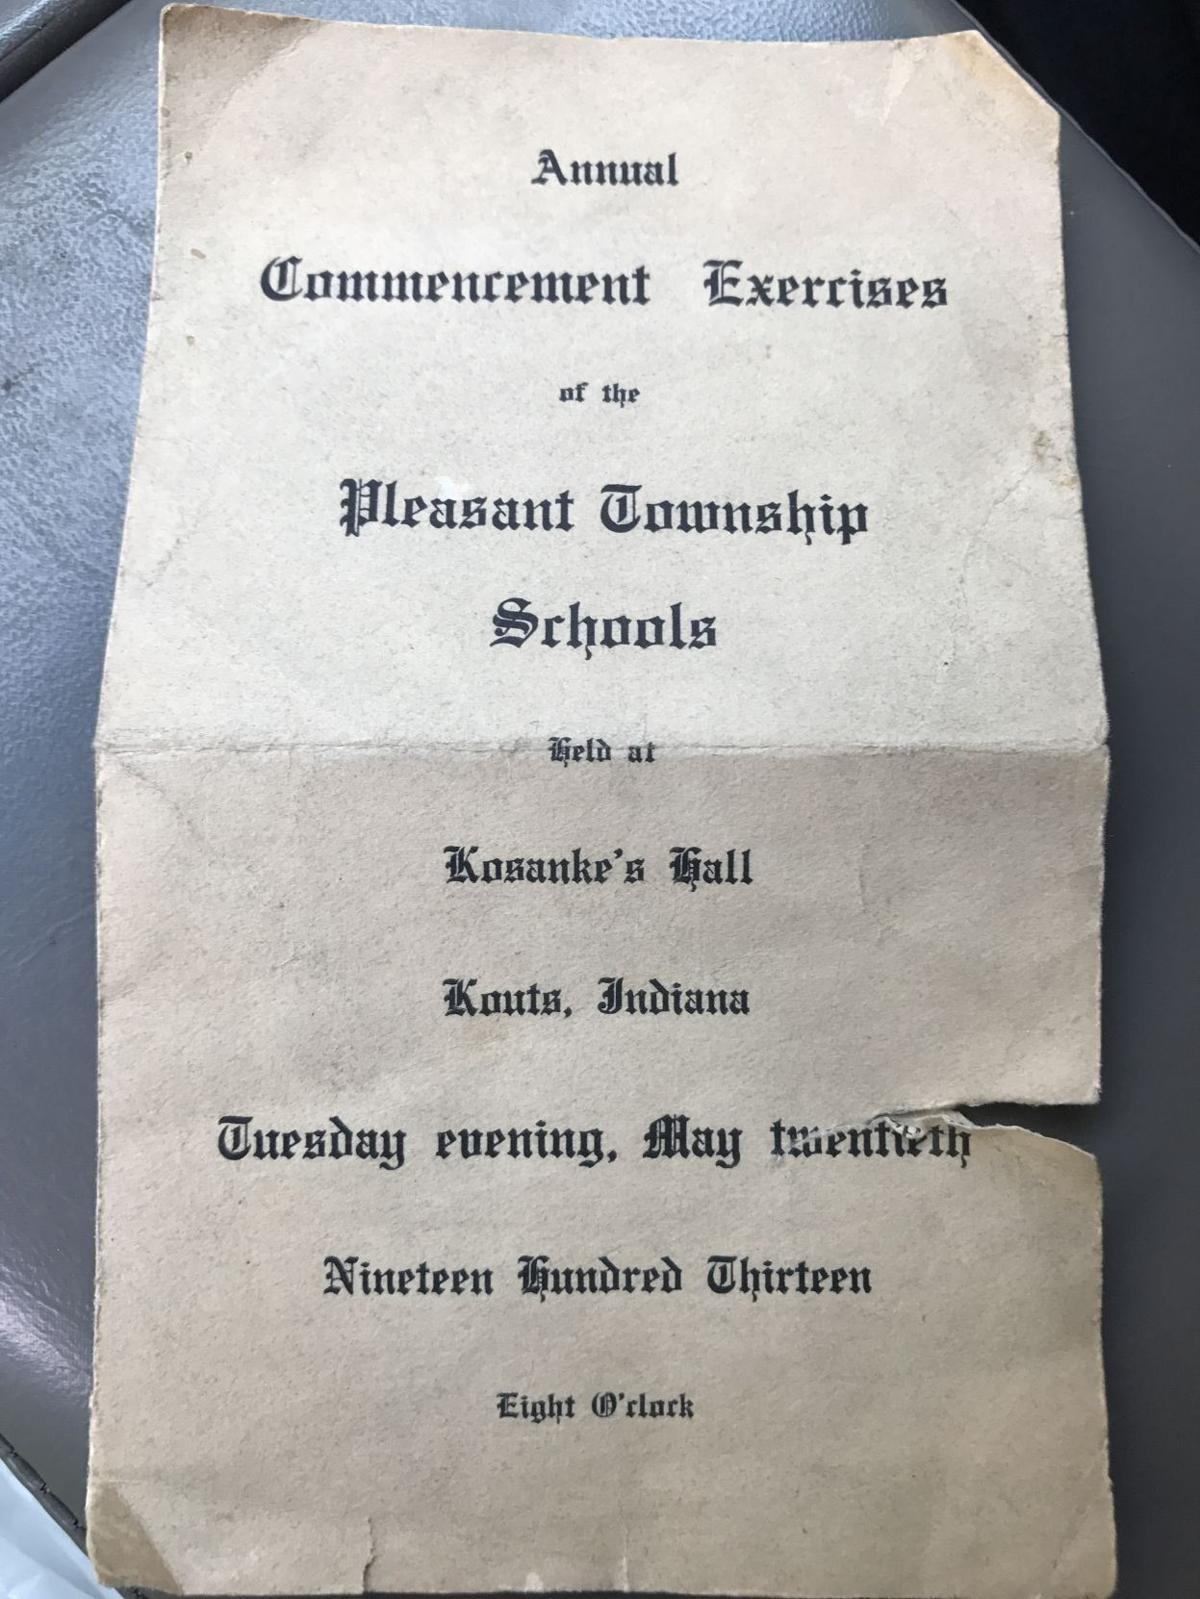 High school commencement programs